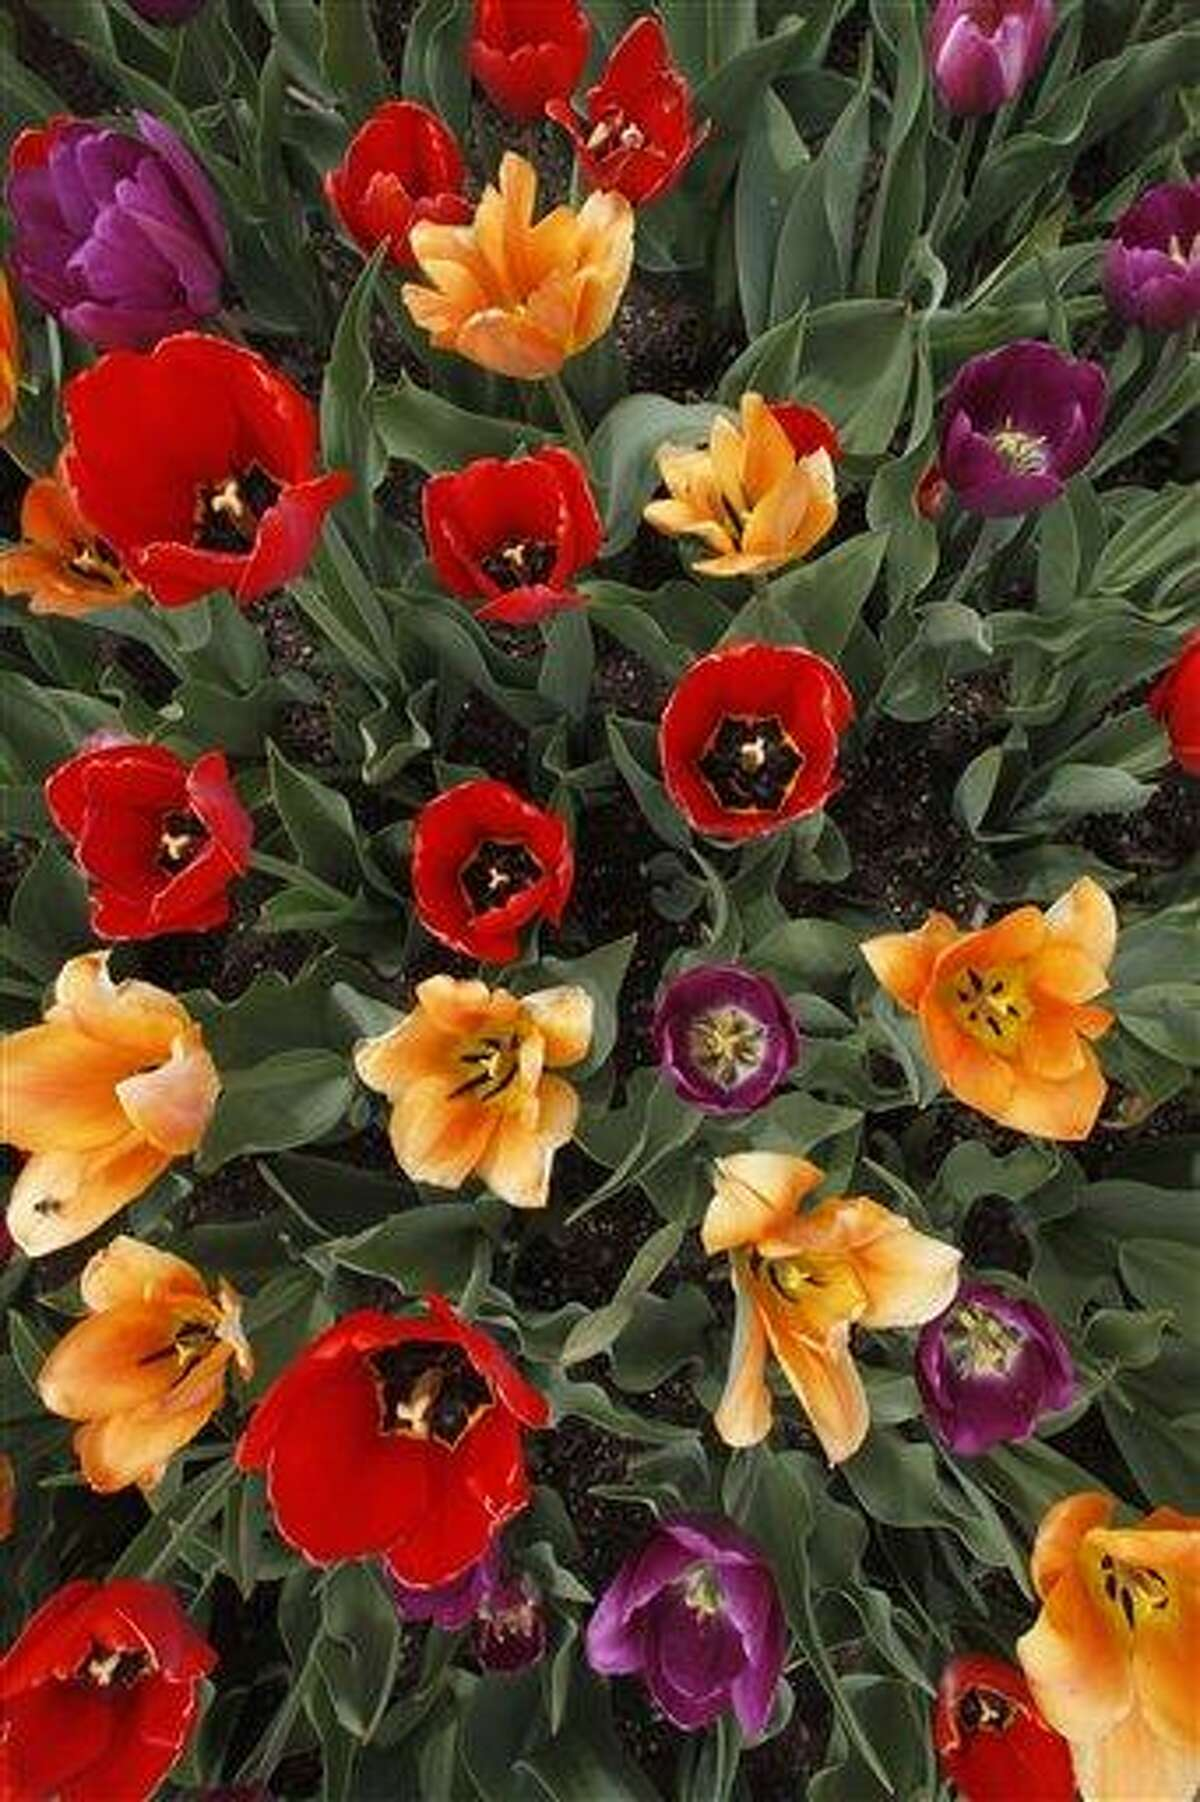 Associated Press photo: Tulips